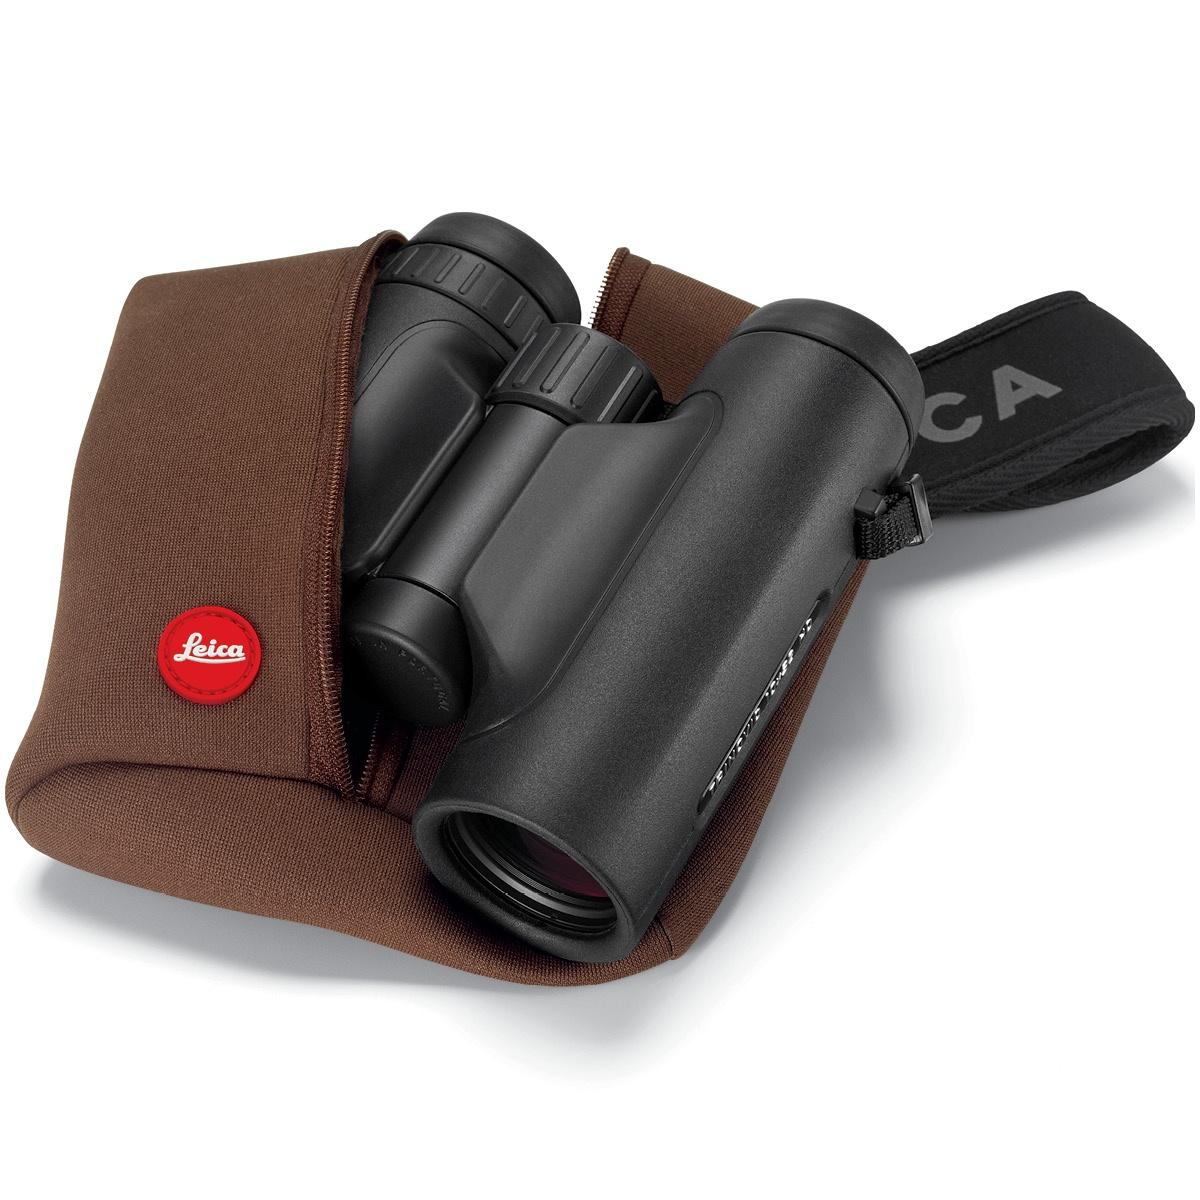 Leica Trinovid 10x32 HD